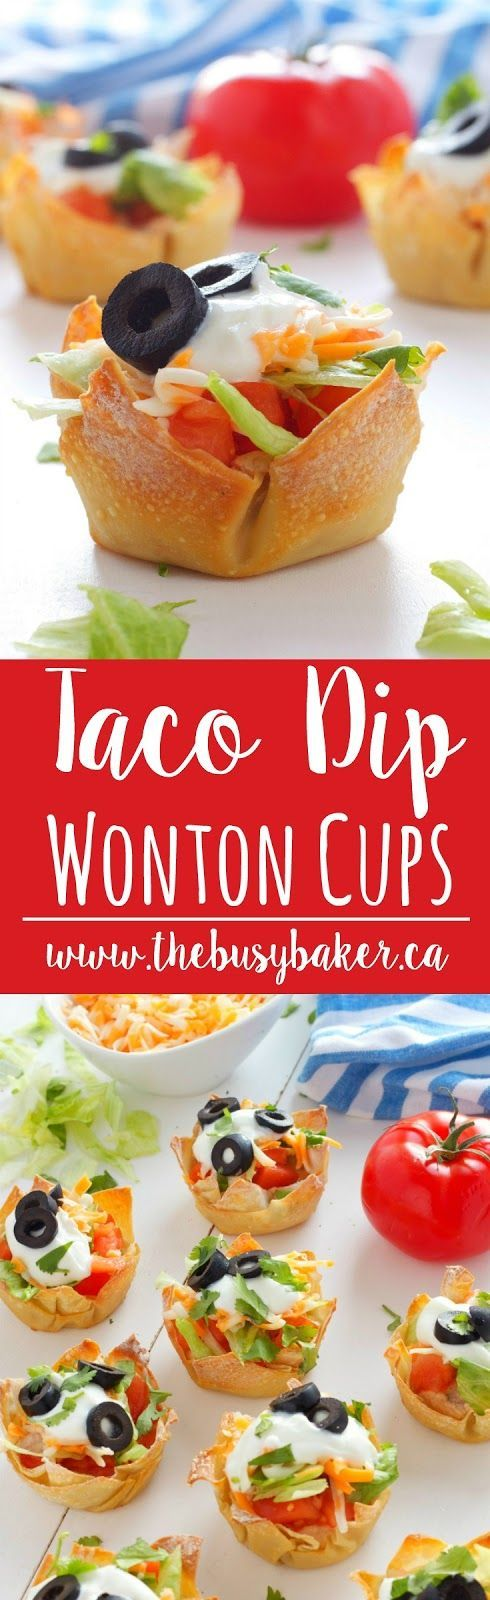 Mexican Taco Dip Wonton Cups #CincoDeMayo www.thebusybaker.ca